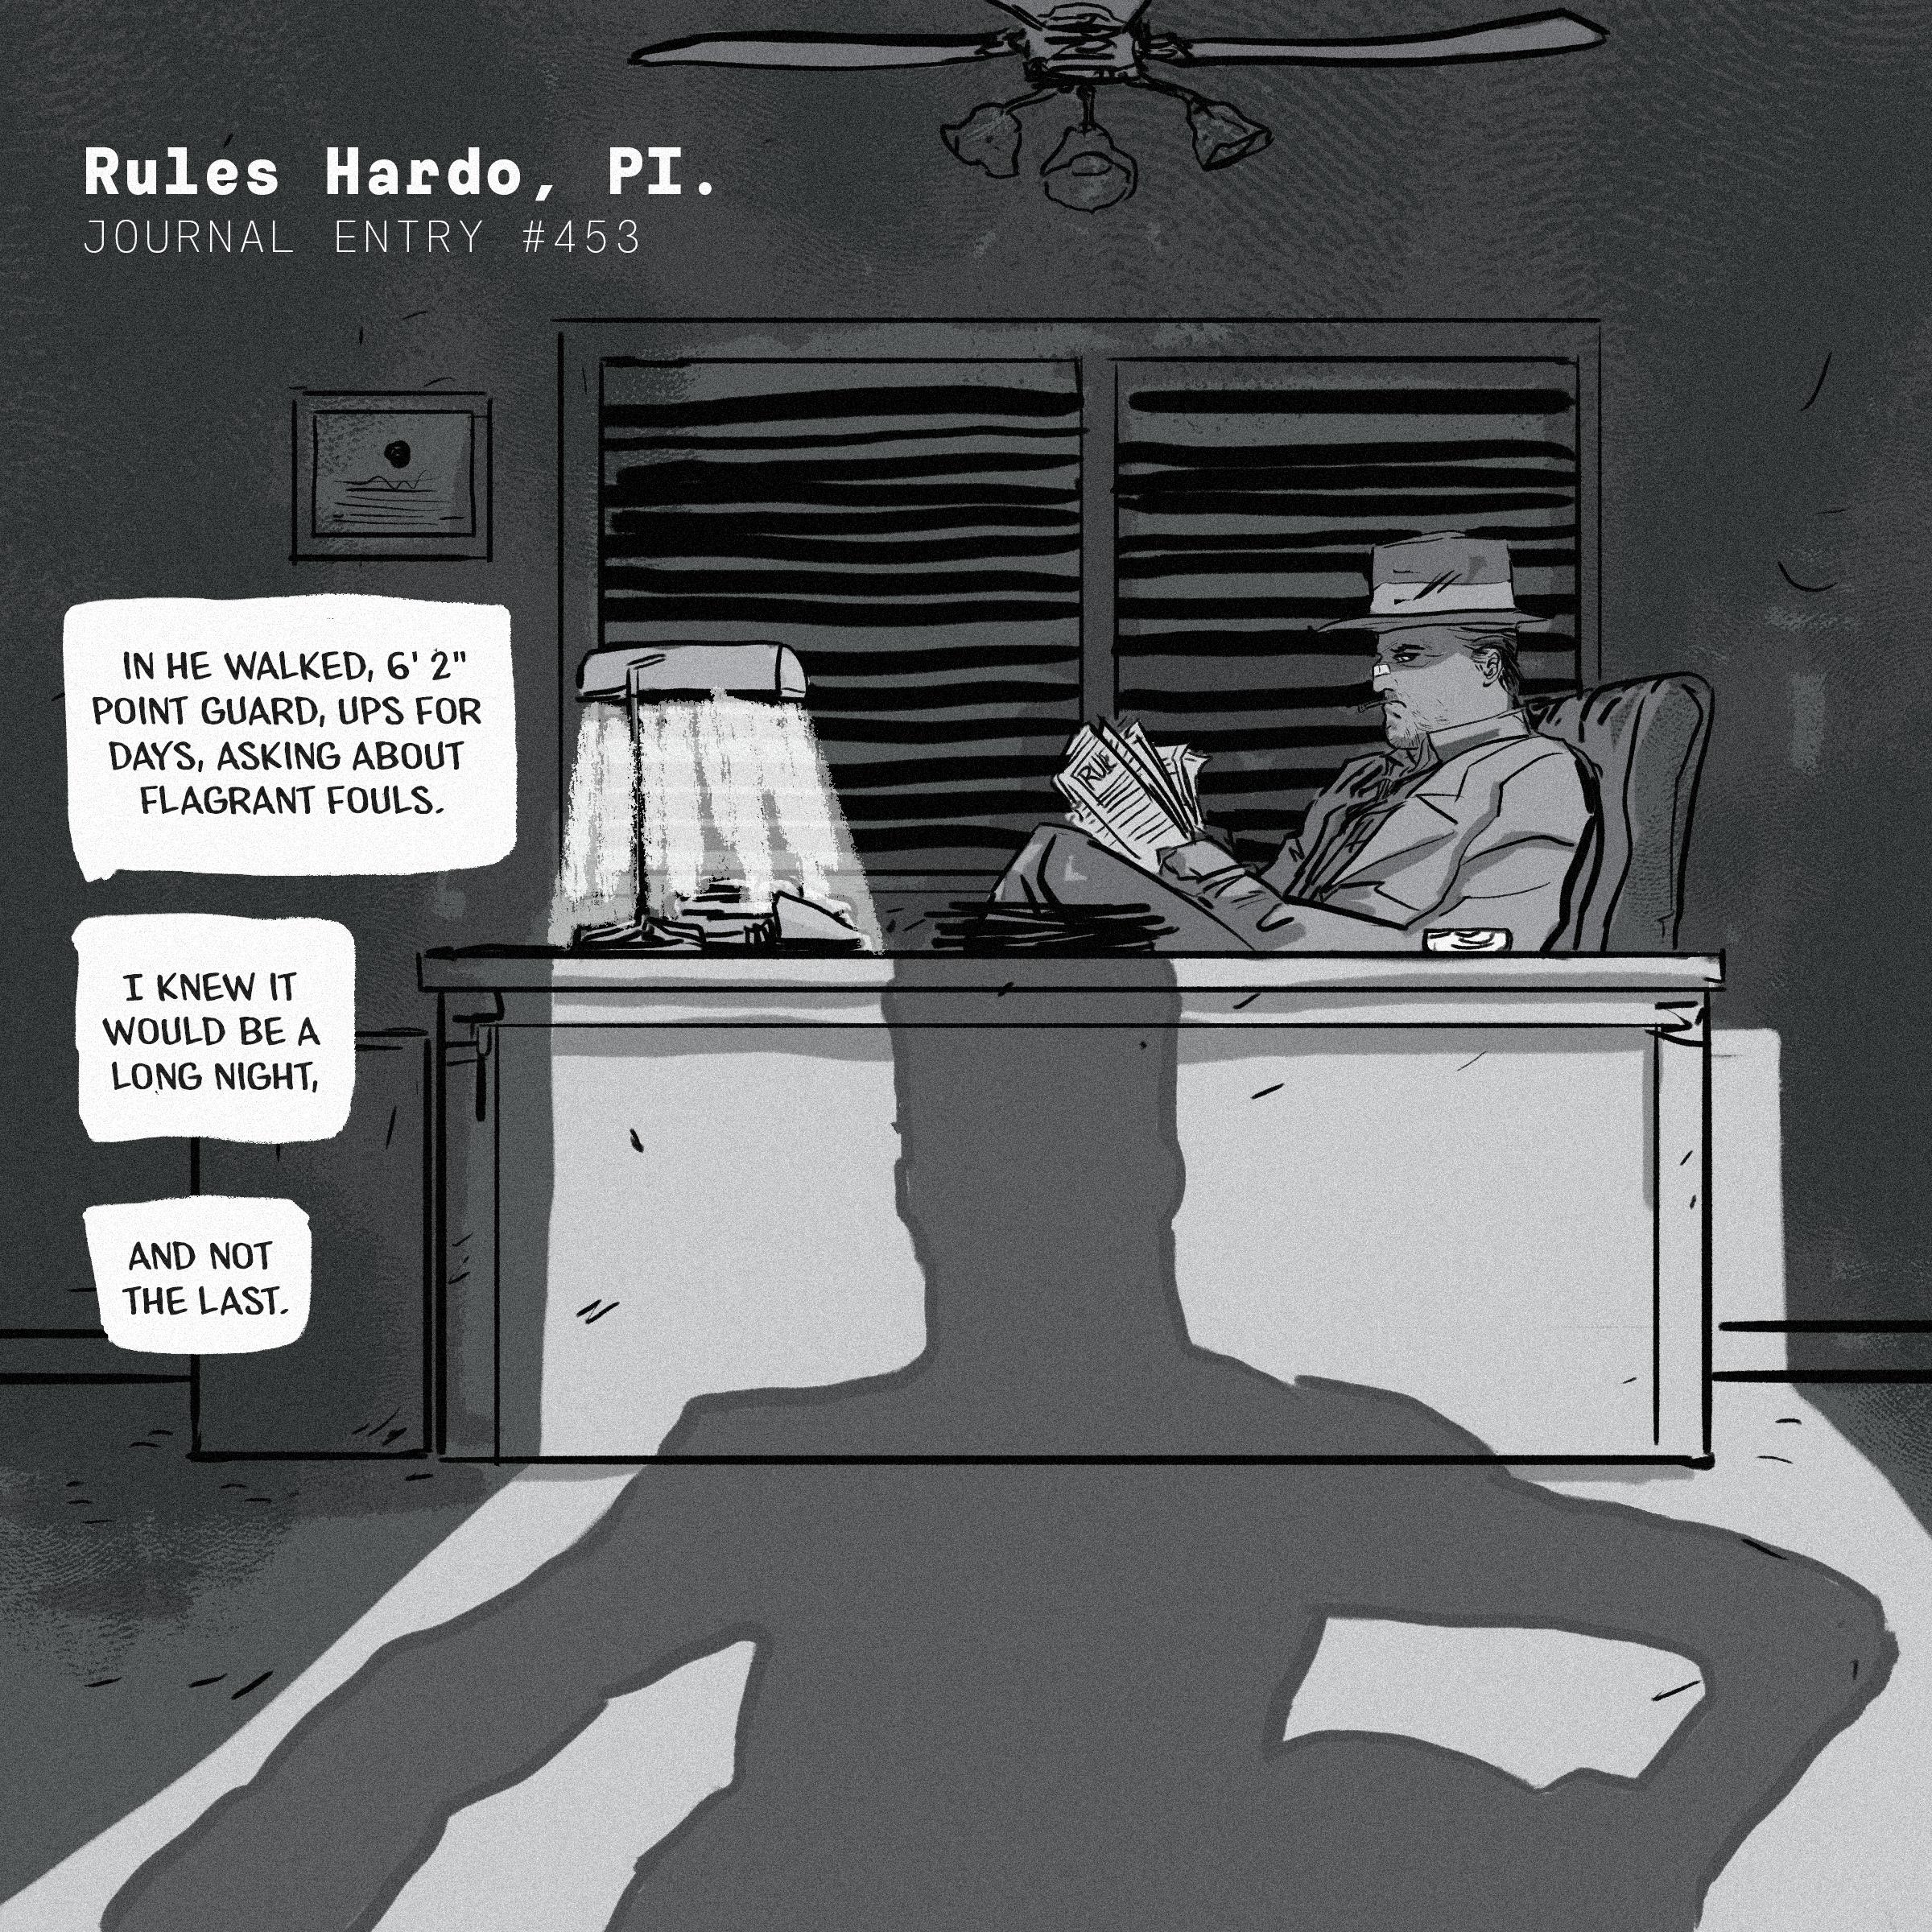 rules_hardo.png